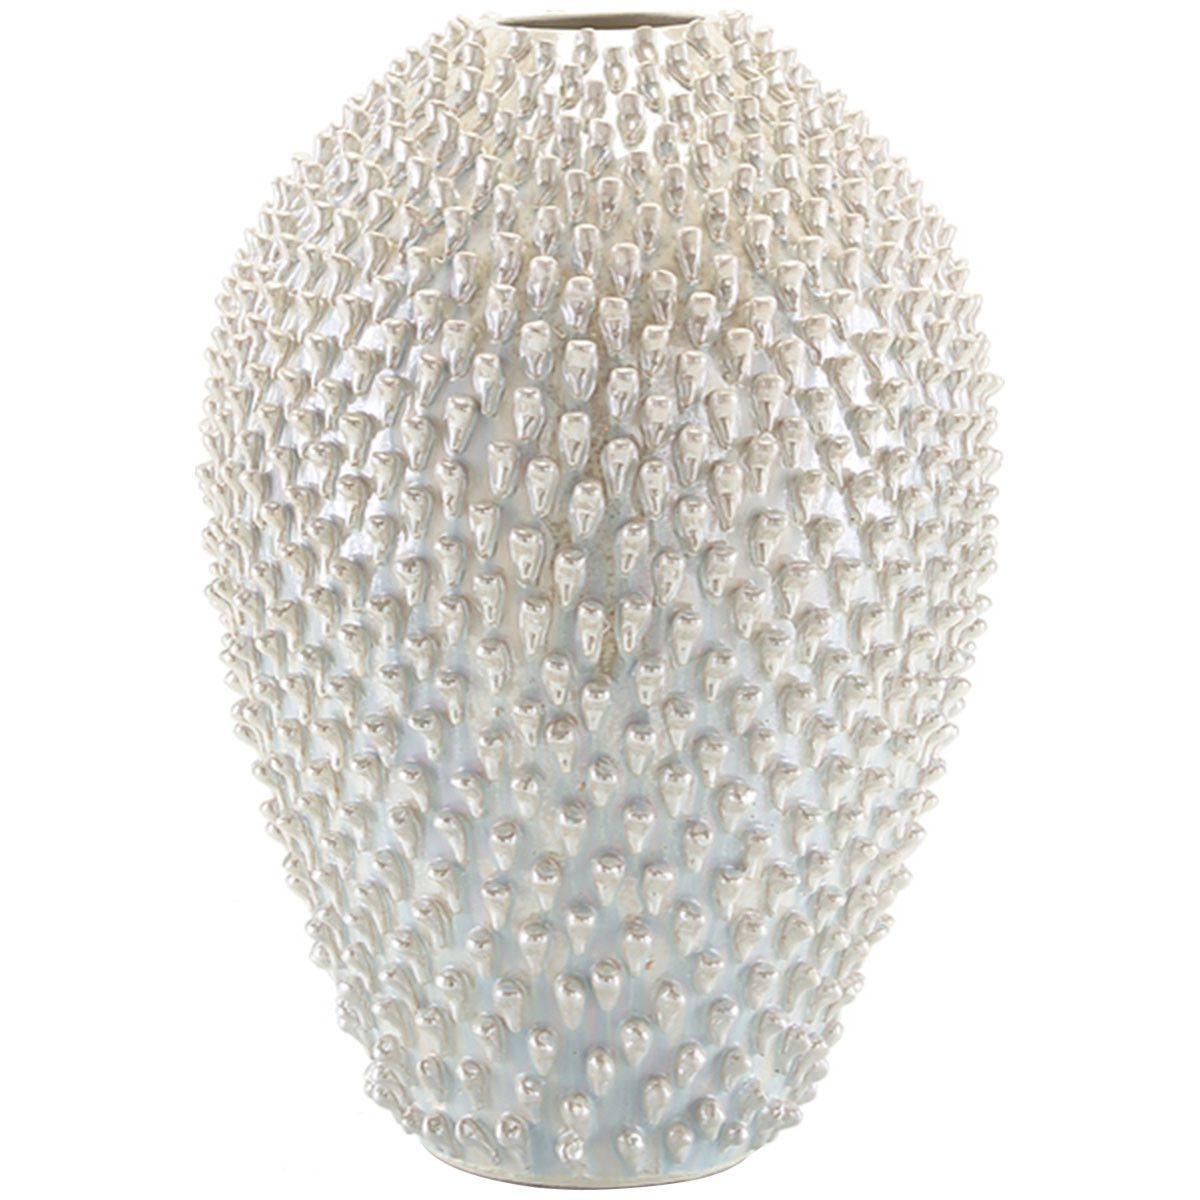 John richard white iridescent spiny vase shop now on pinterest